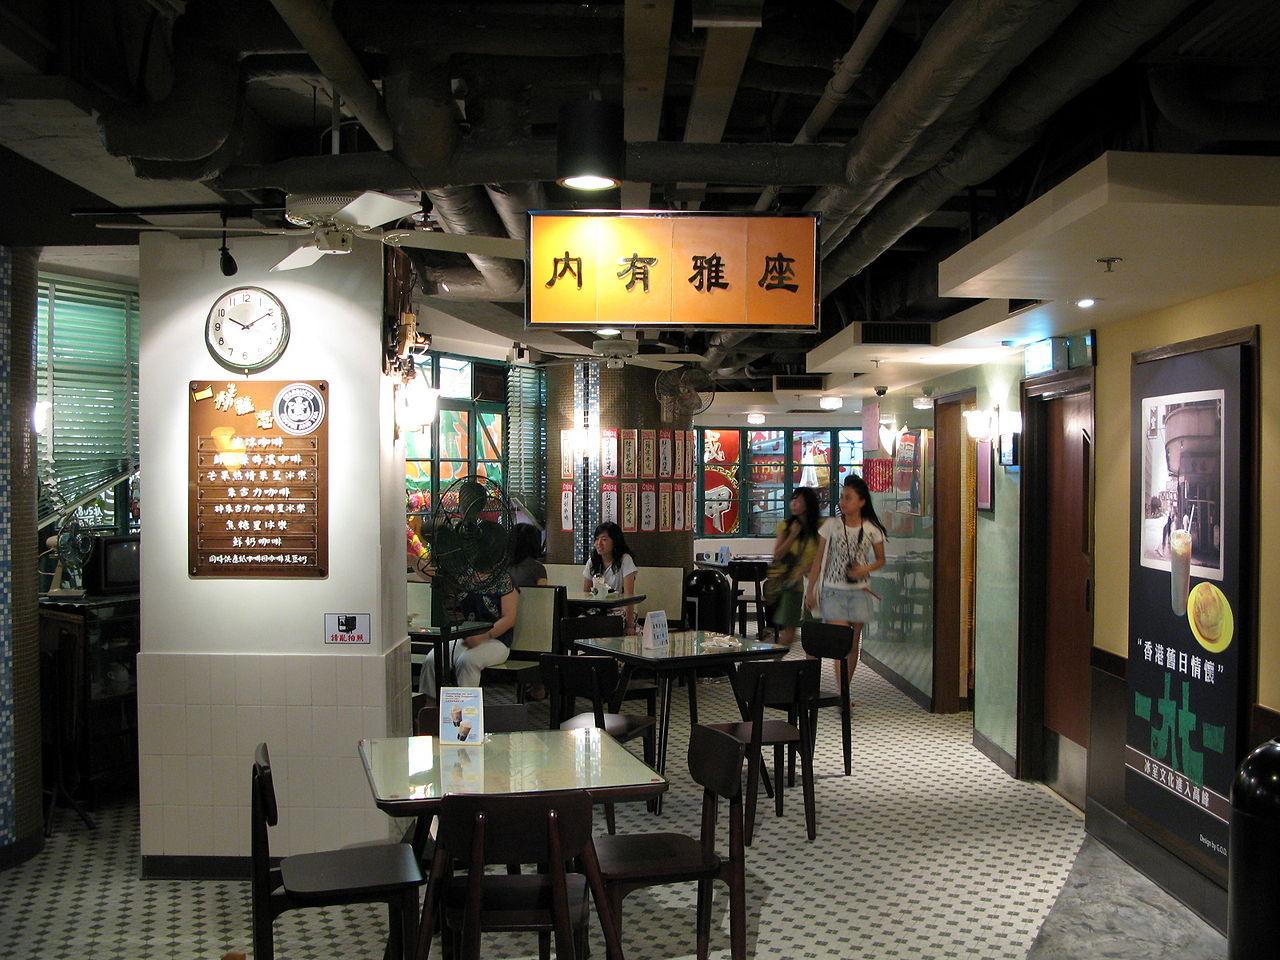 Hong Kong Duddell Street Starbucks, by WiNG